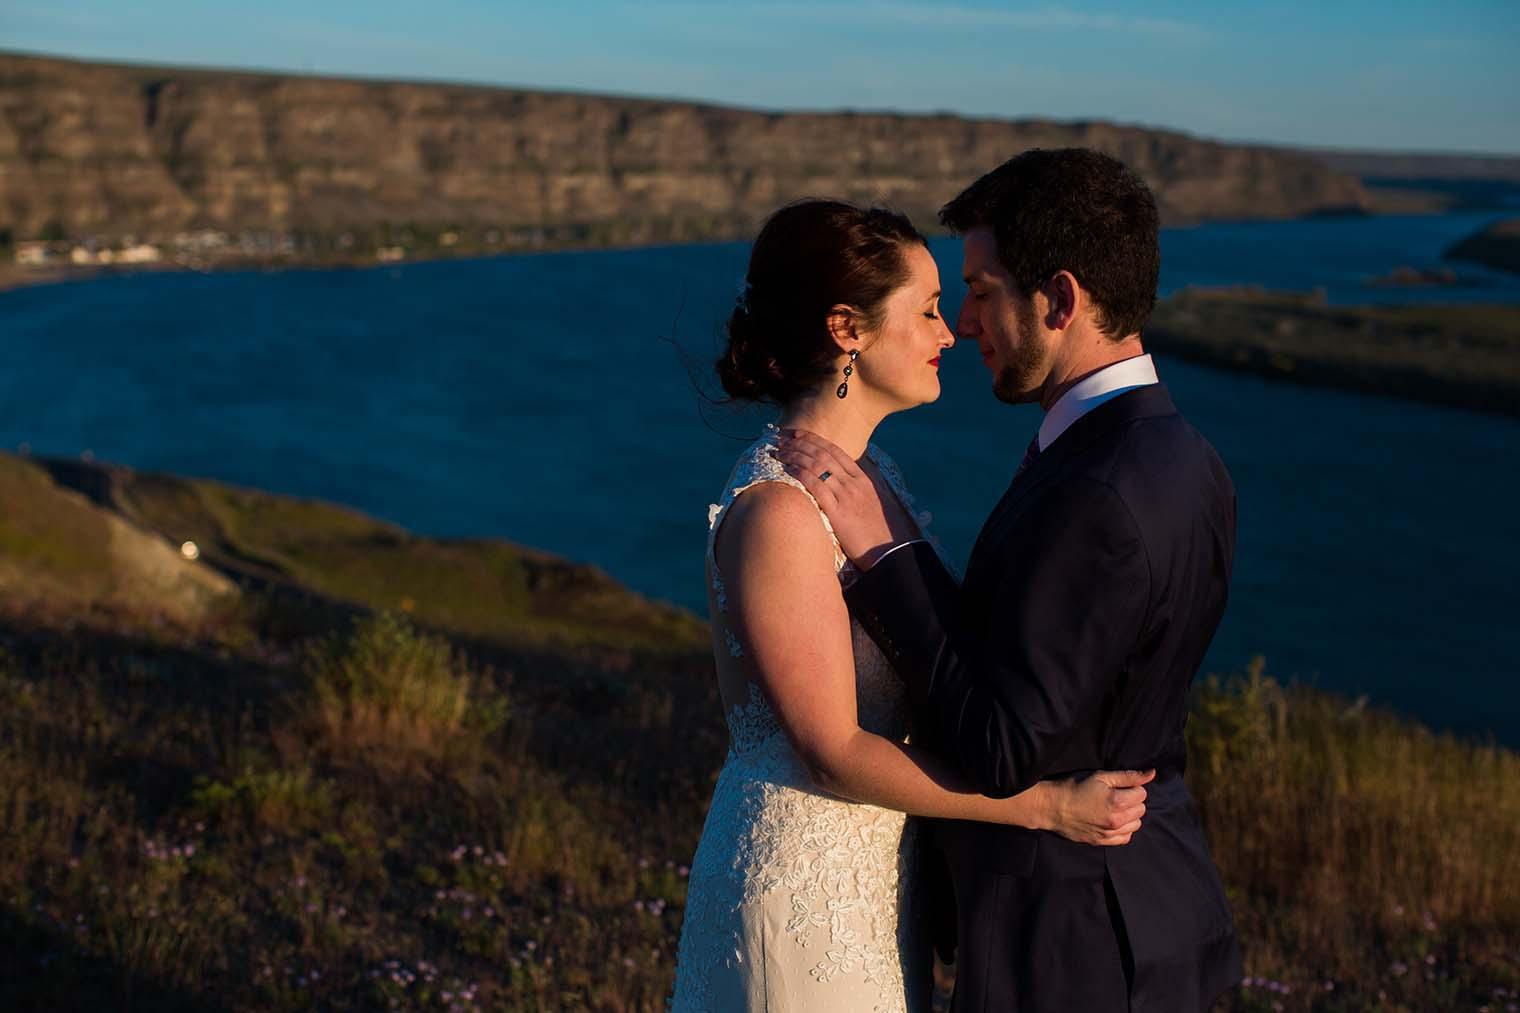 Wedding Photographer located in Wenatchee Washington